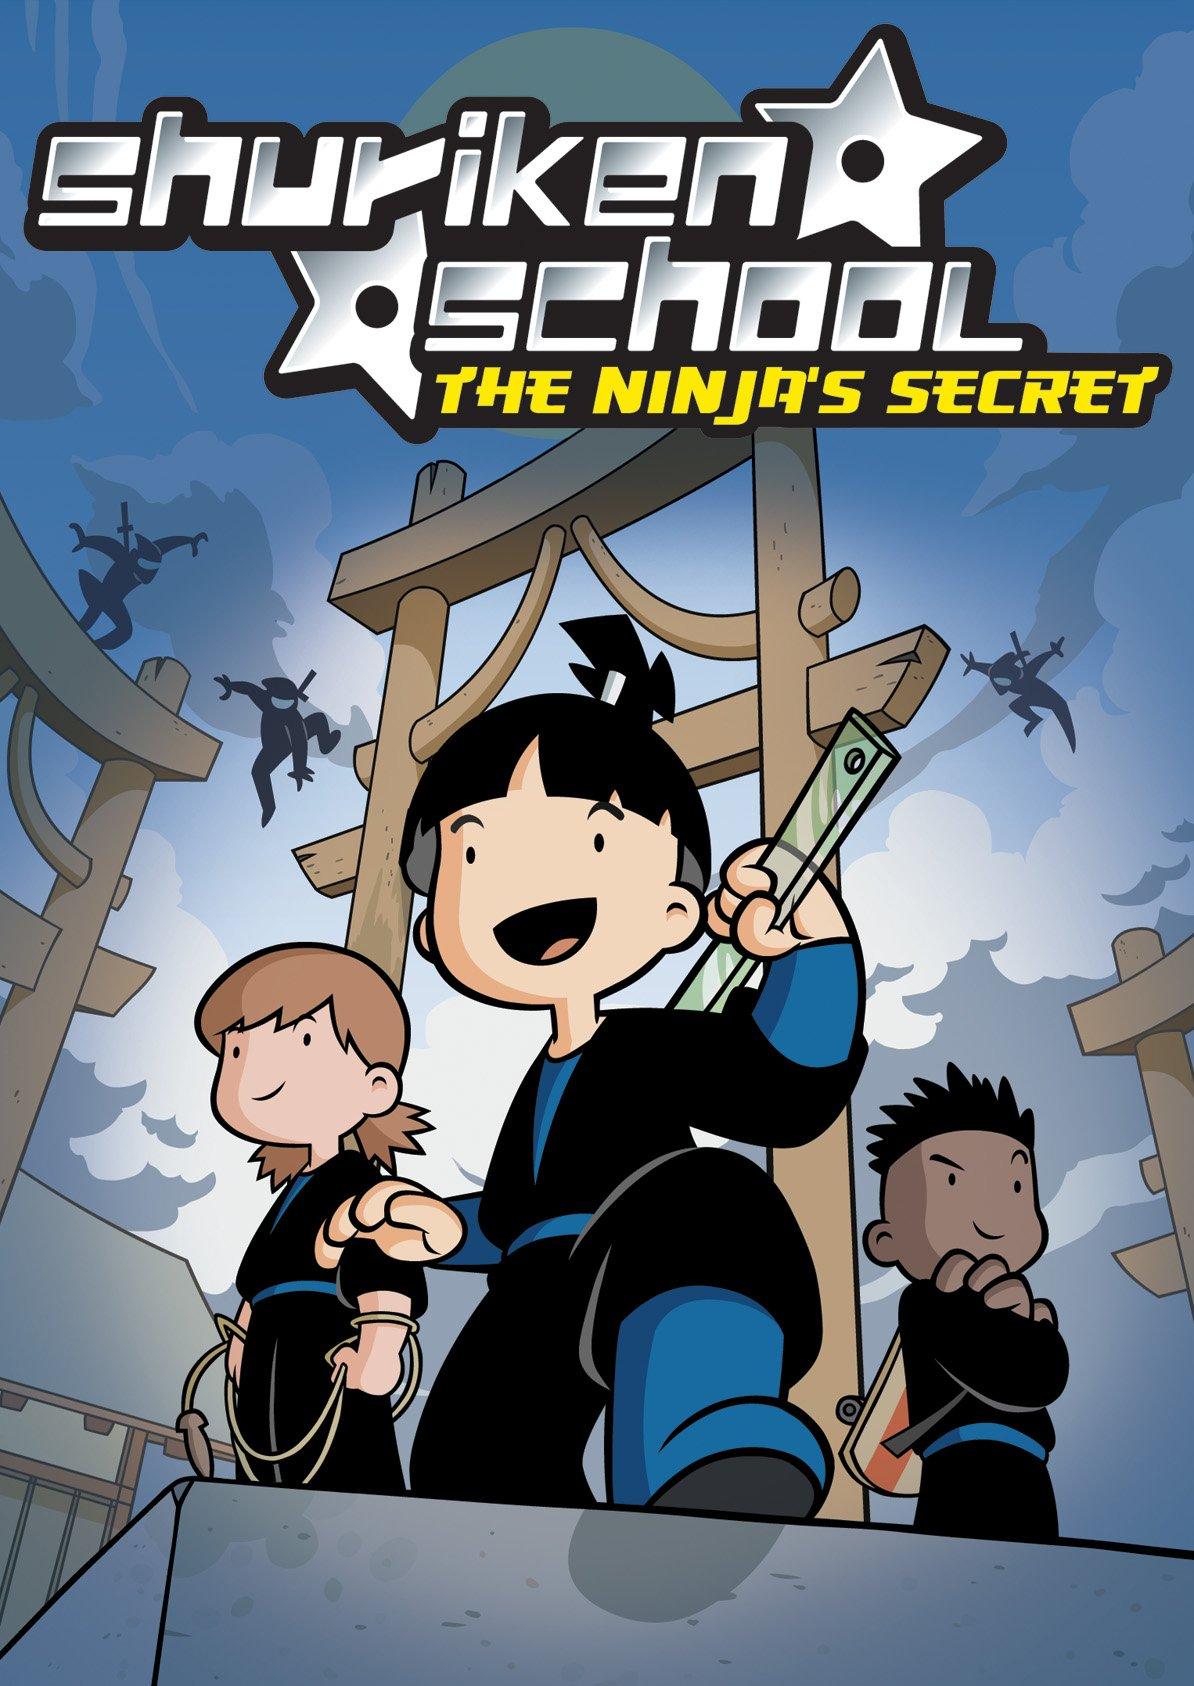 DVD : Shuriken School: The Ninja's Secret (DVD)